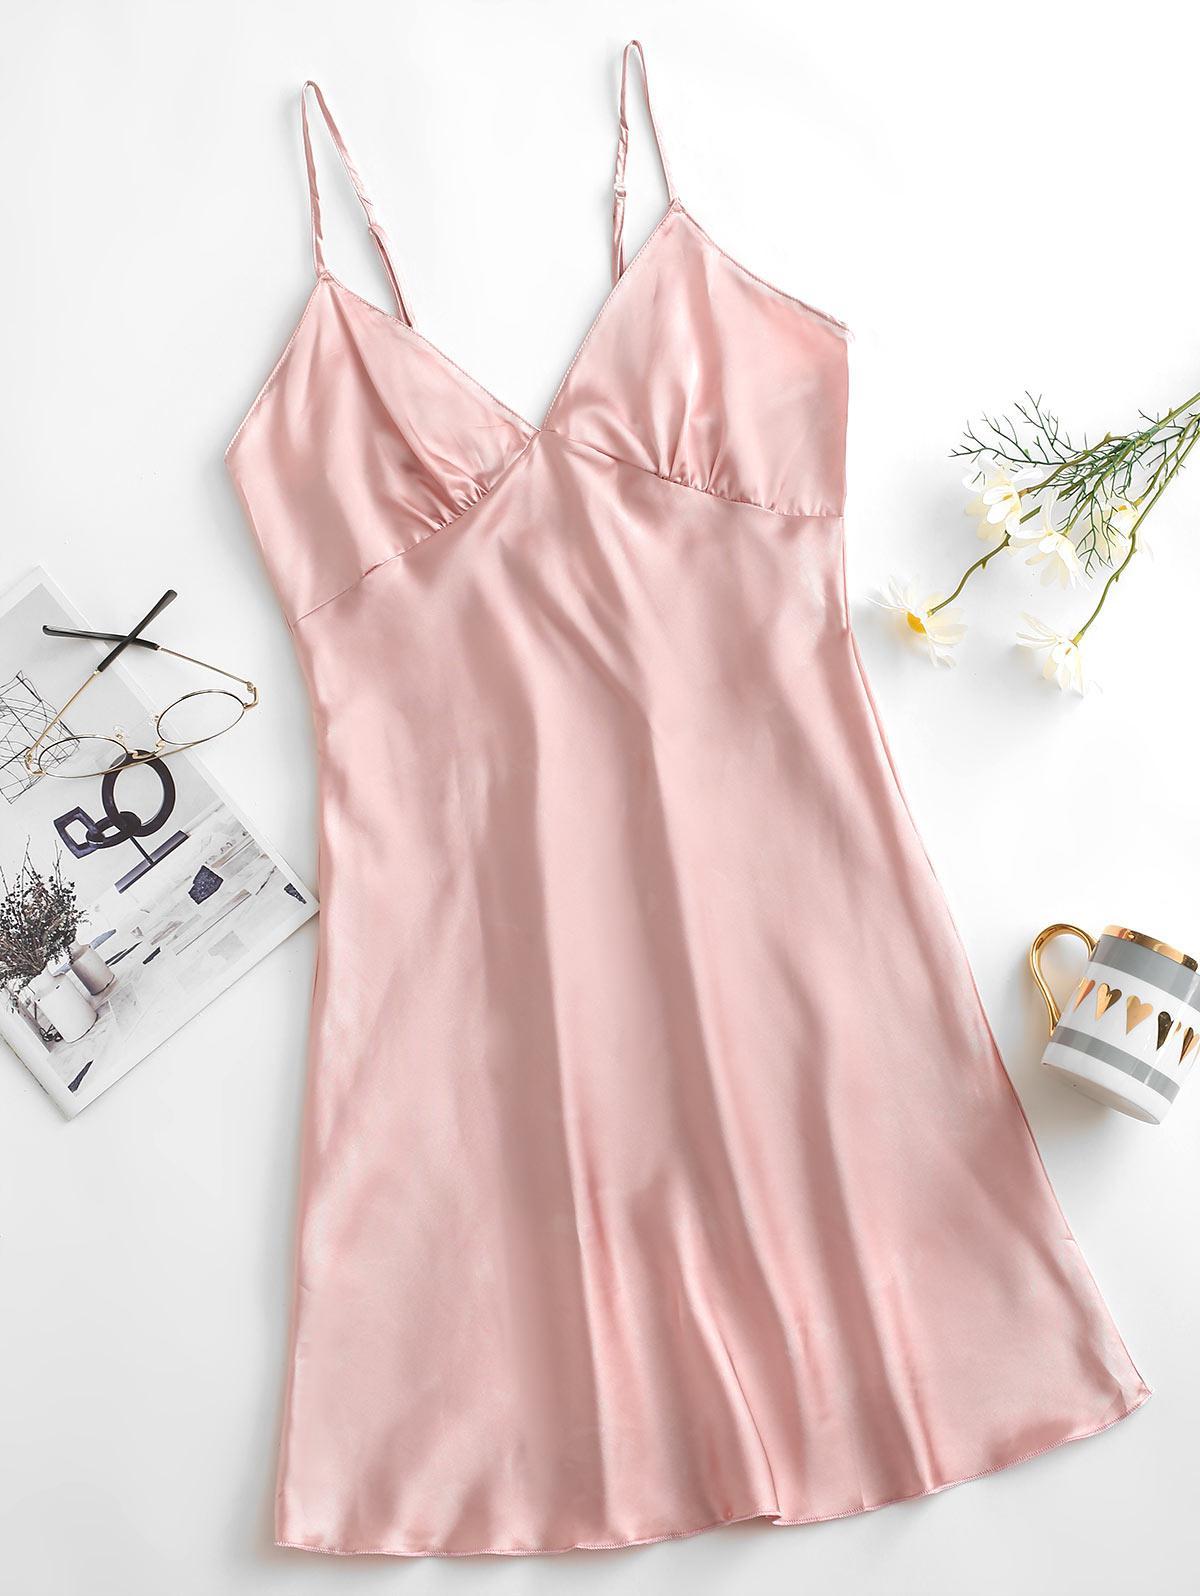 Satin Criss Cross Pajama Dress